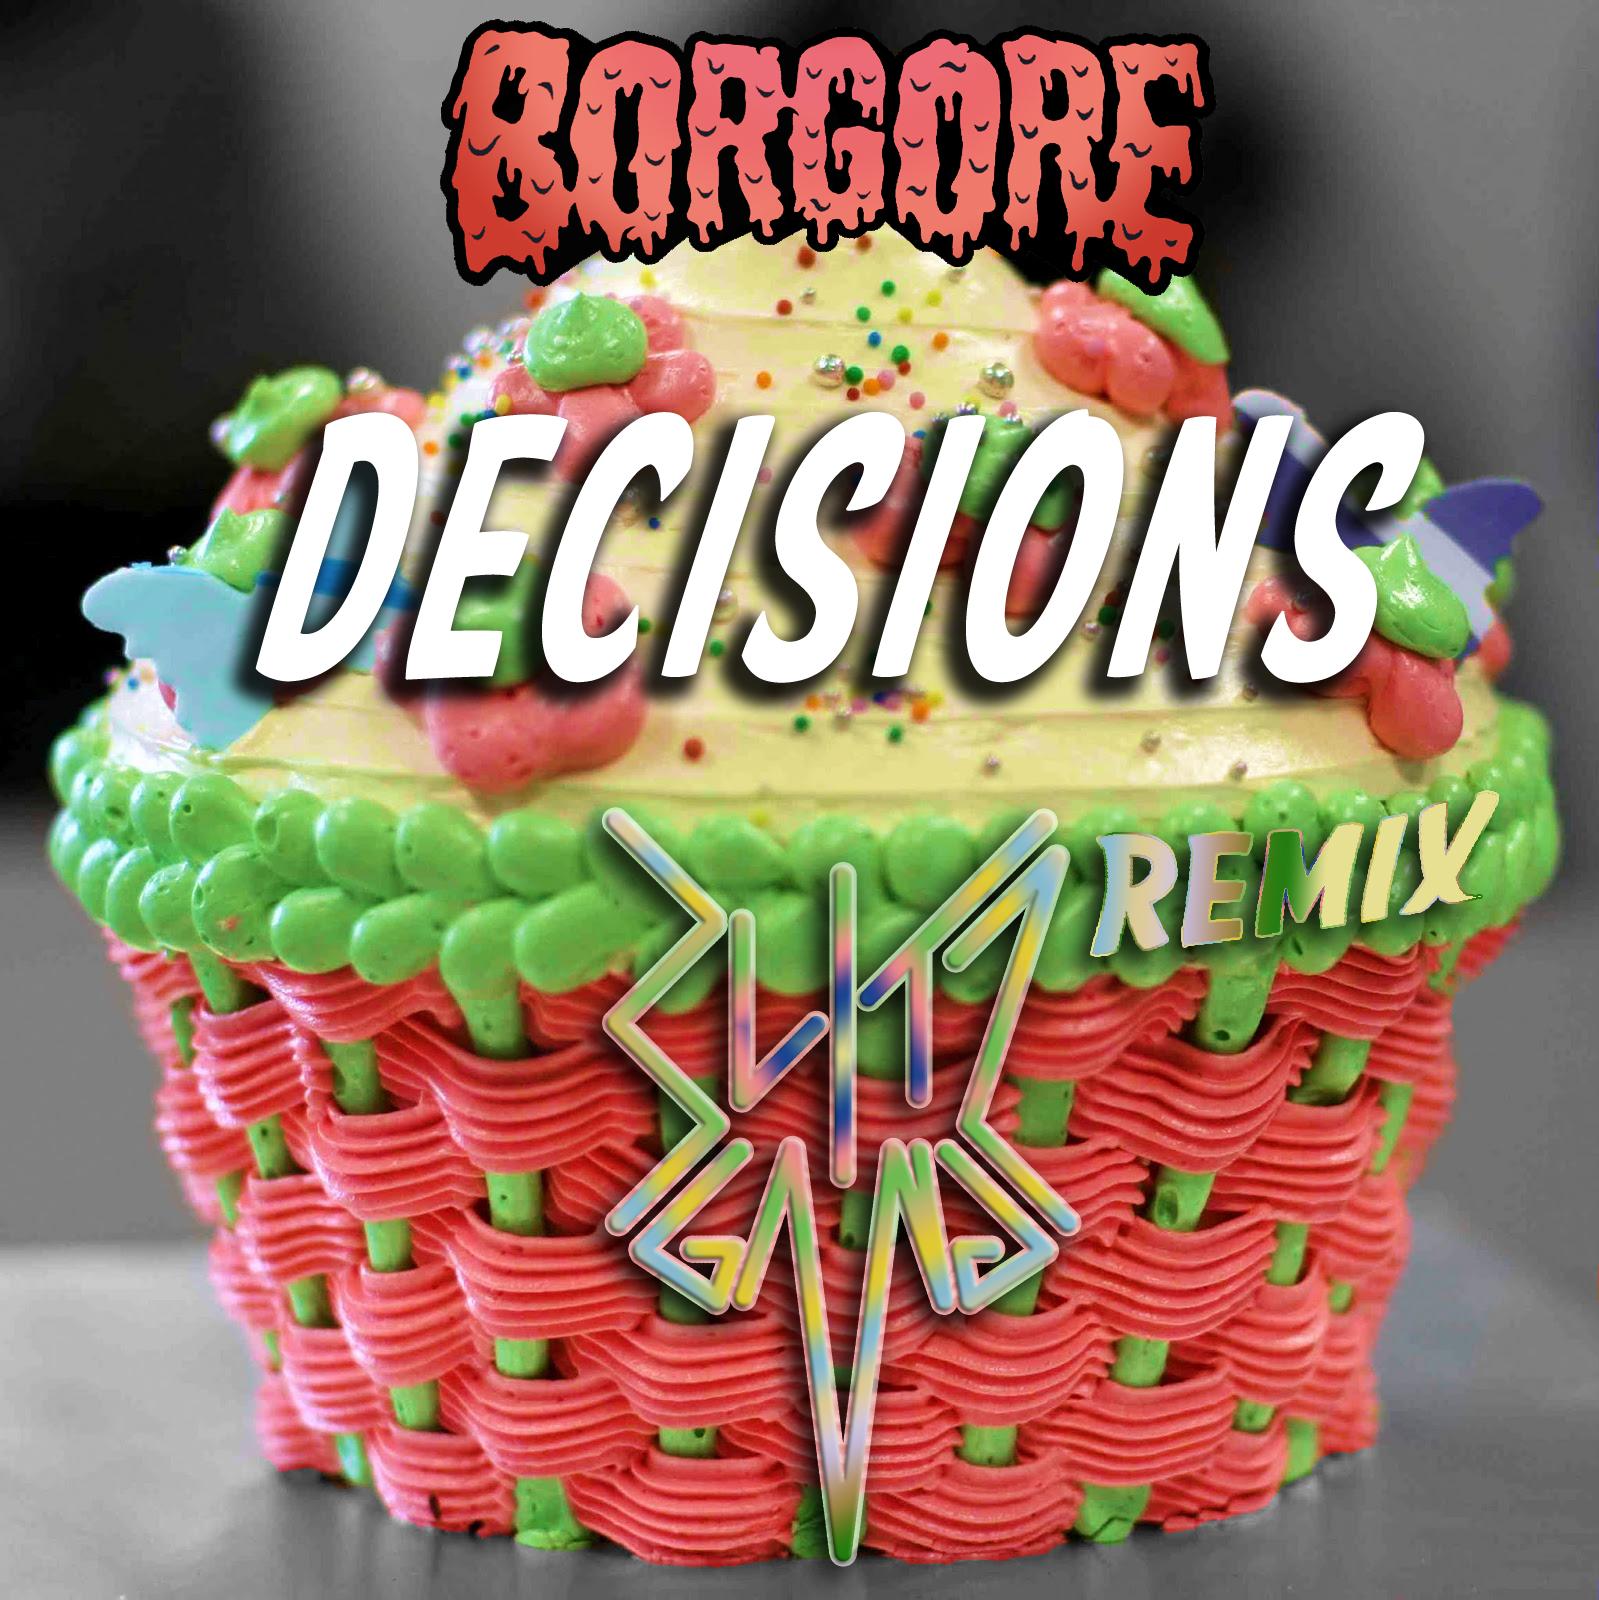 Borgore Cake Up Tomahawk